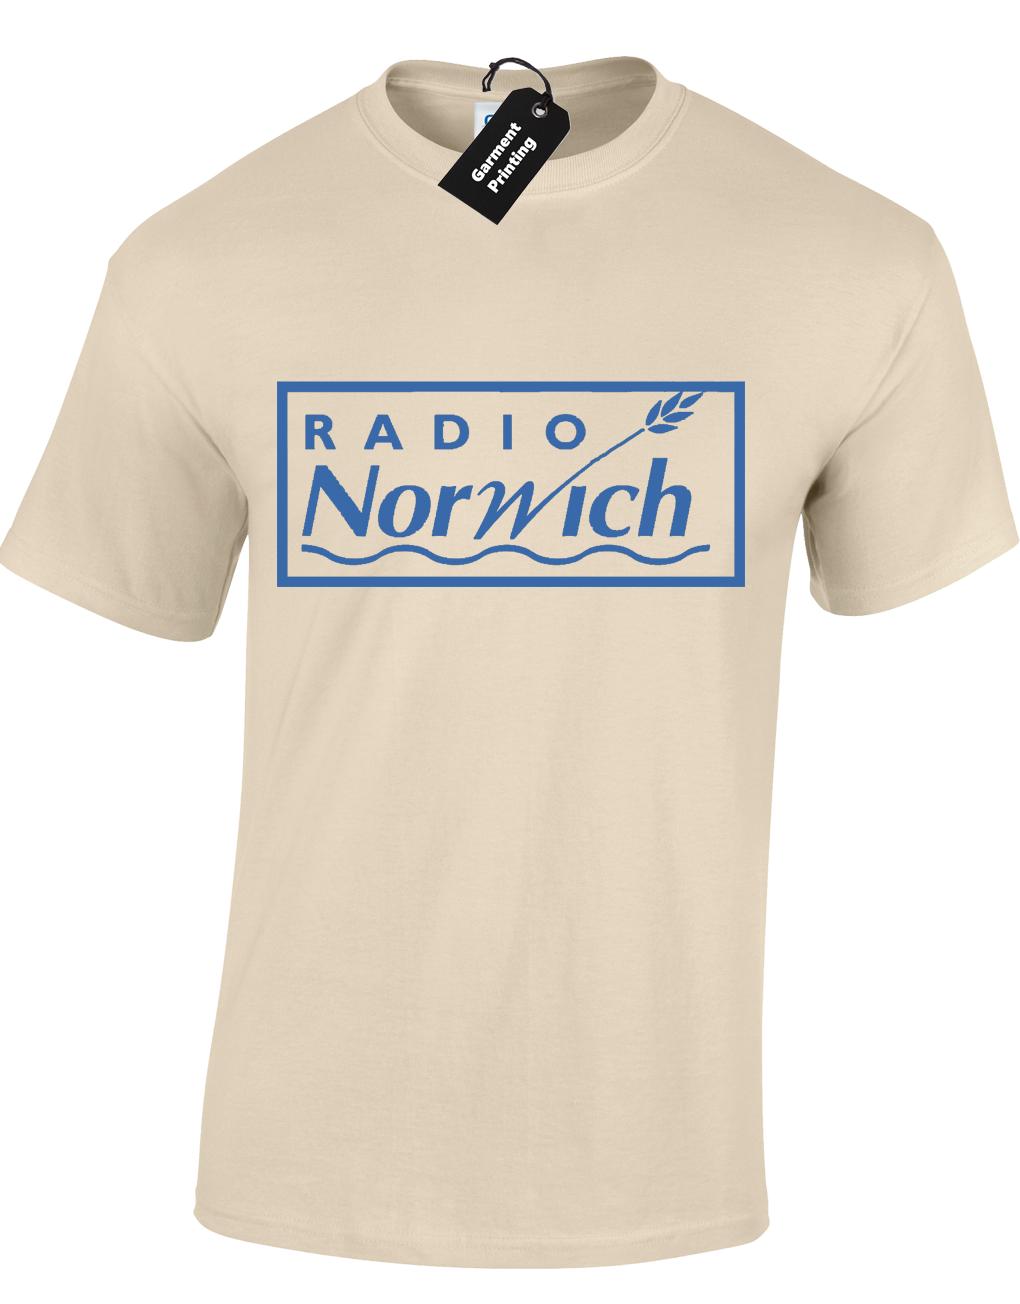 RADIO NORWICH MENS T SHIRT TEE FUNNY ALAN NORTH NORFOLK PARTRIDGE JACKANACKANORY